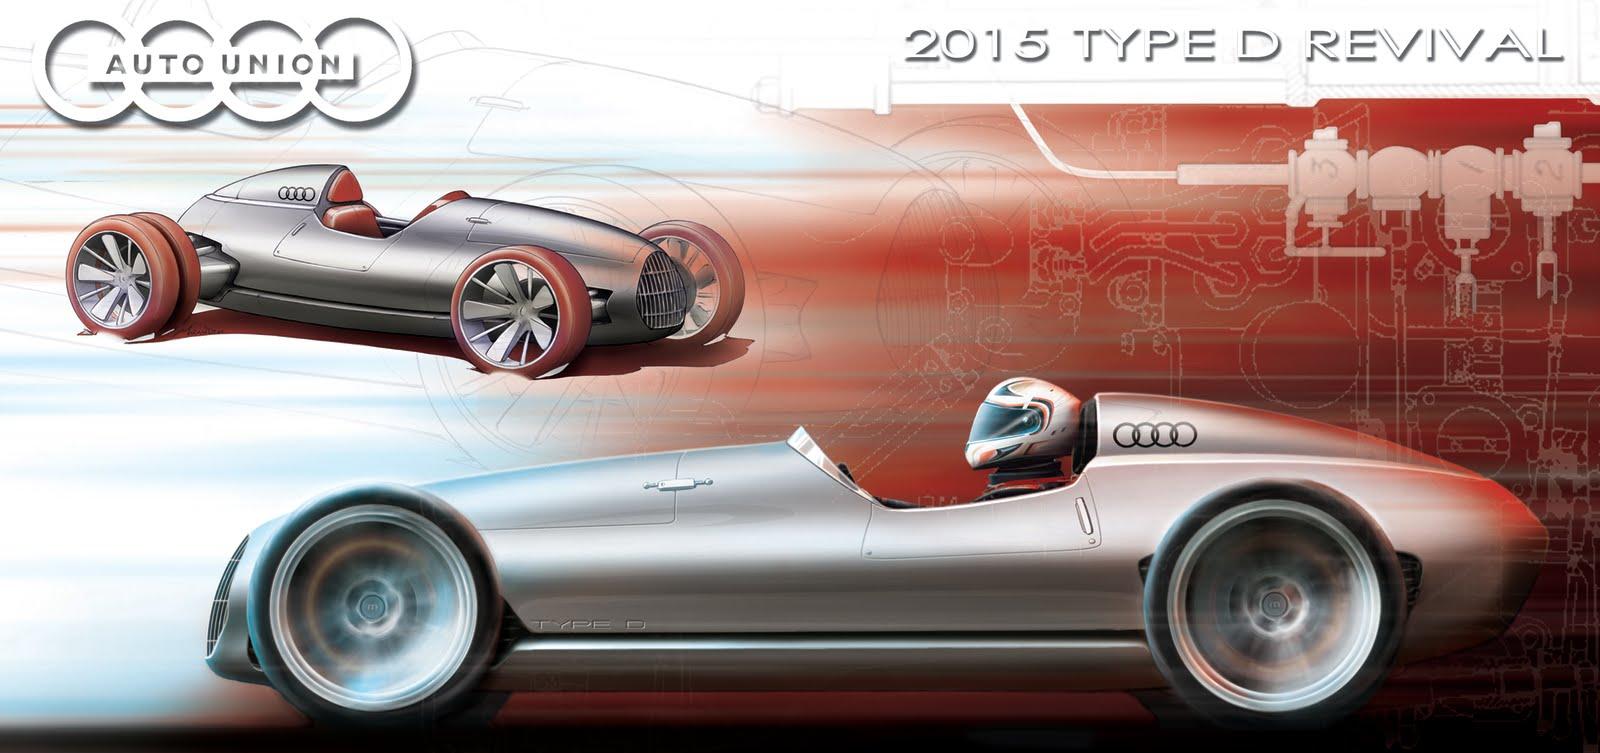 2015 Auto Union Type D Iedei